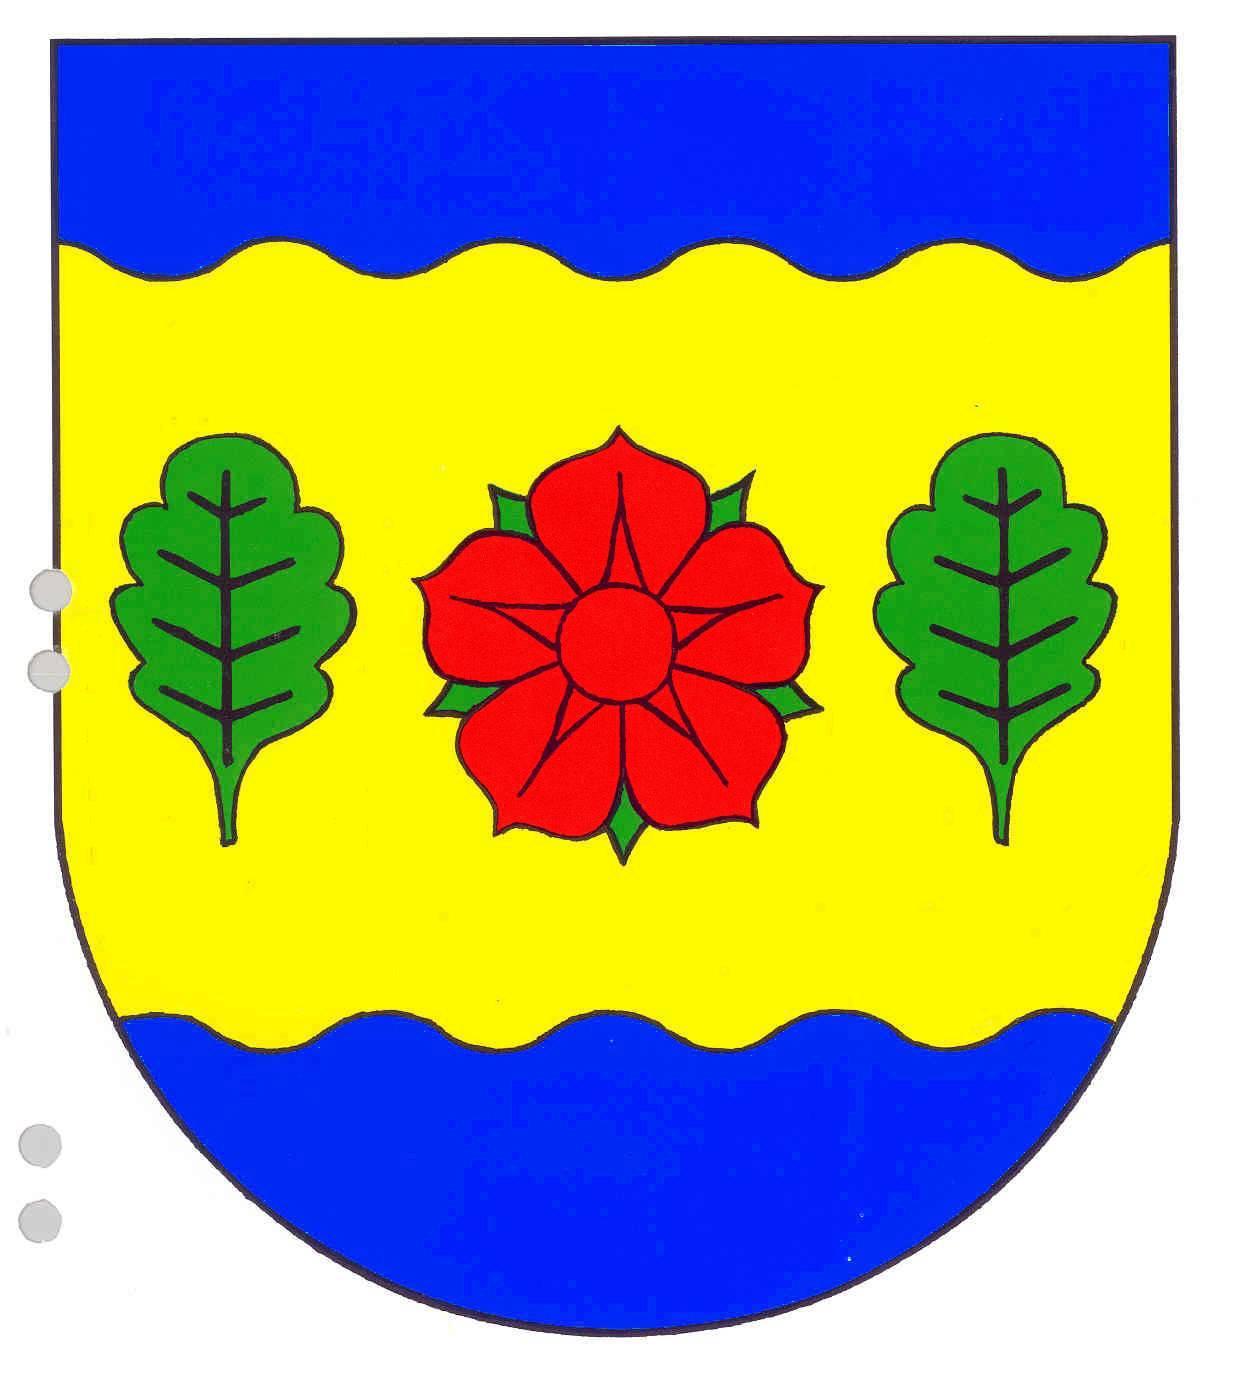 Wappen GemeindeLoose, Kreis Rendsburg-Eckernförde